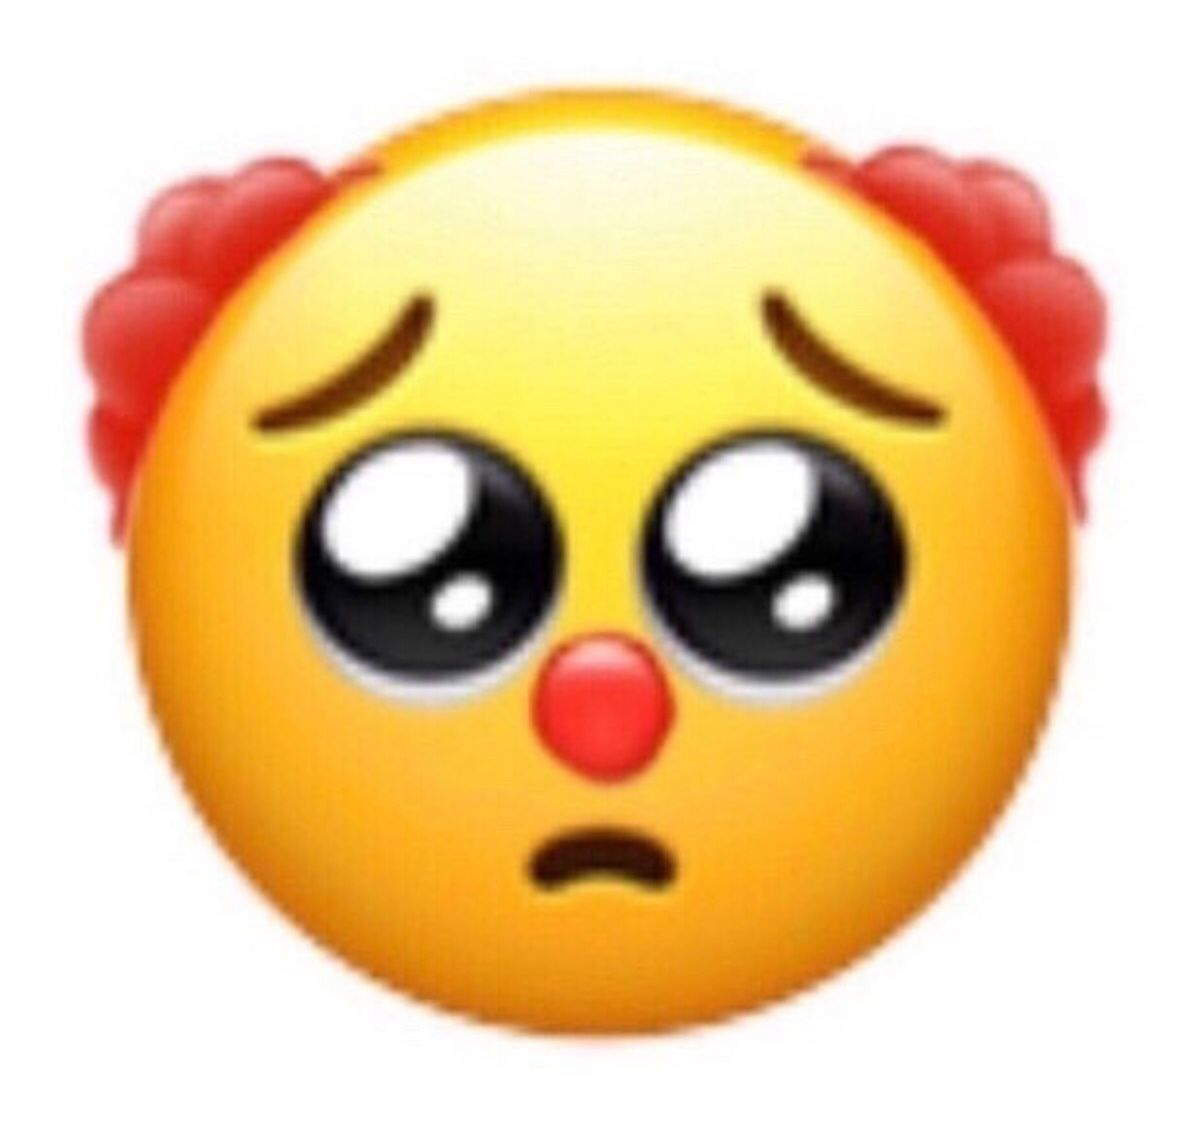 Pin By Liz Coukie On Reaction Pics In 2020 Cute Emoji Wallpaper Emoji Meme Cute Emoji